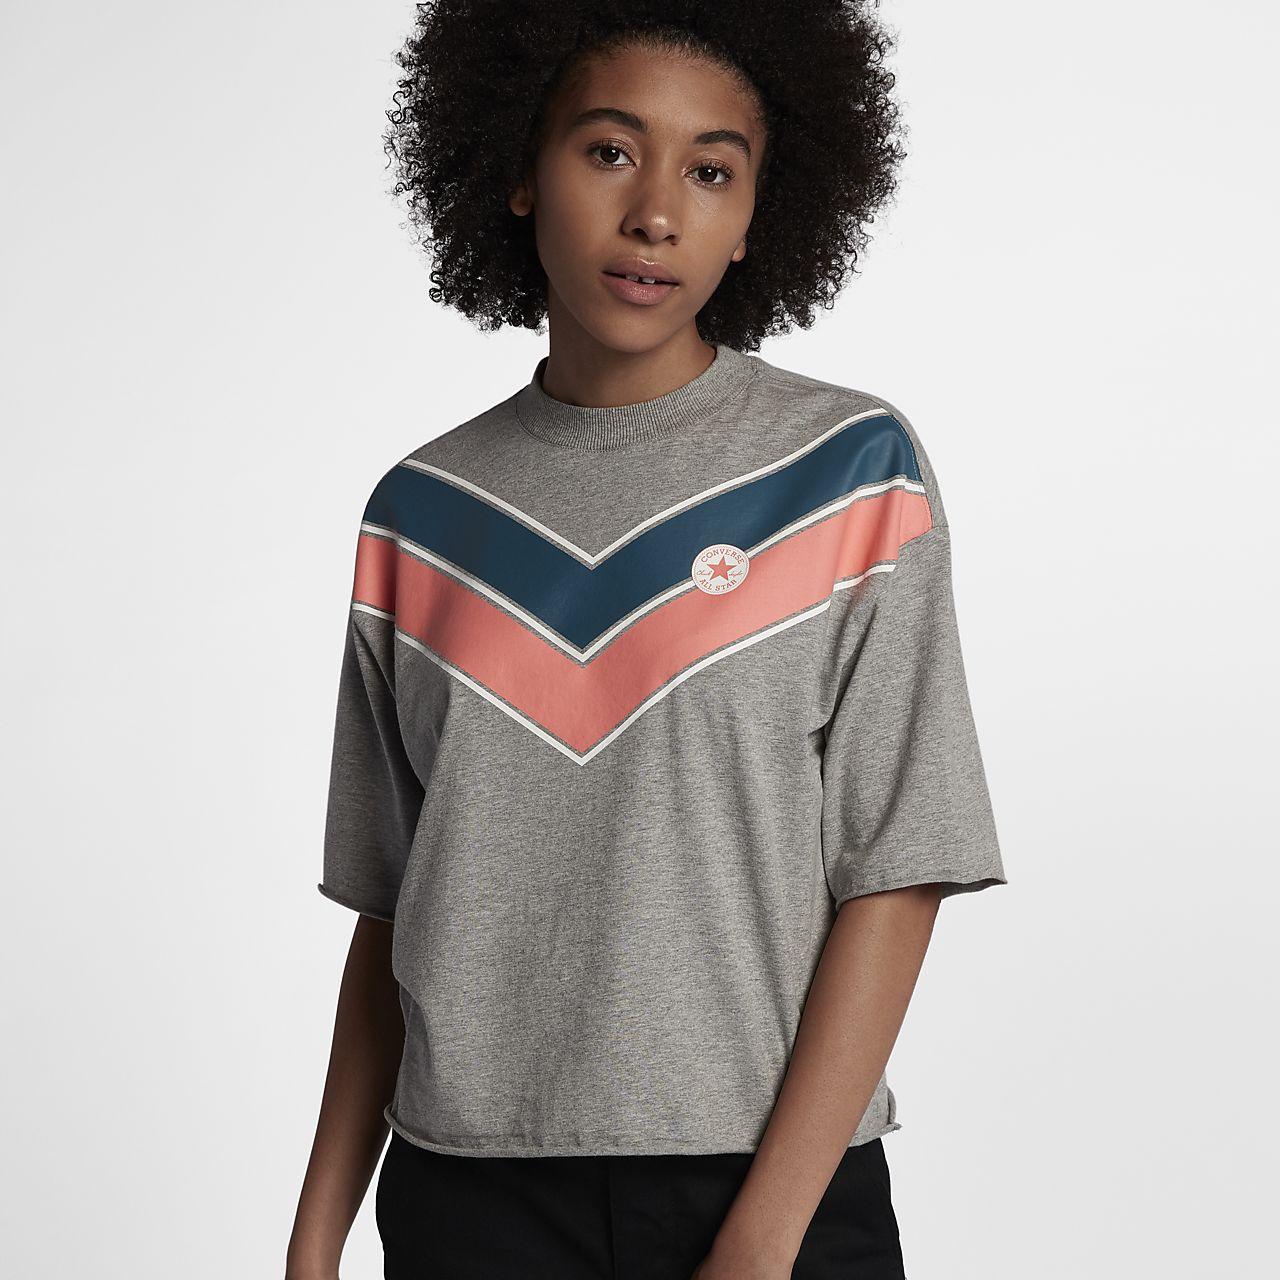 Converse Chevron Mock Neck Women 39 S T Shirt